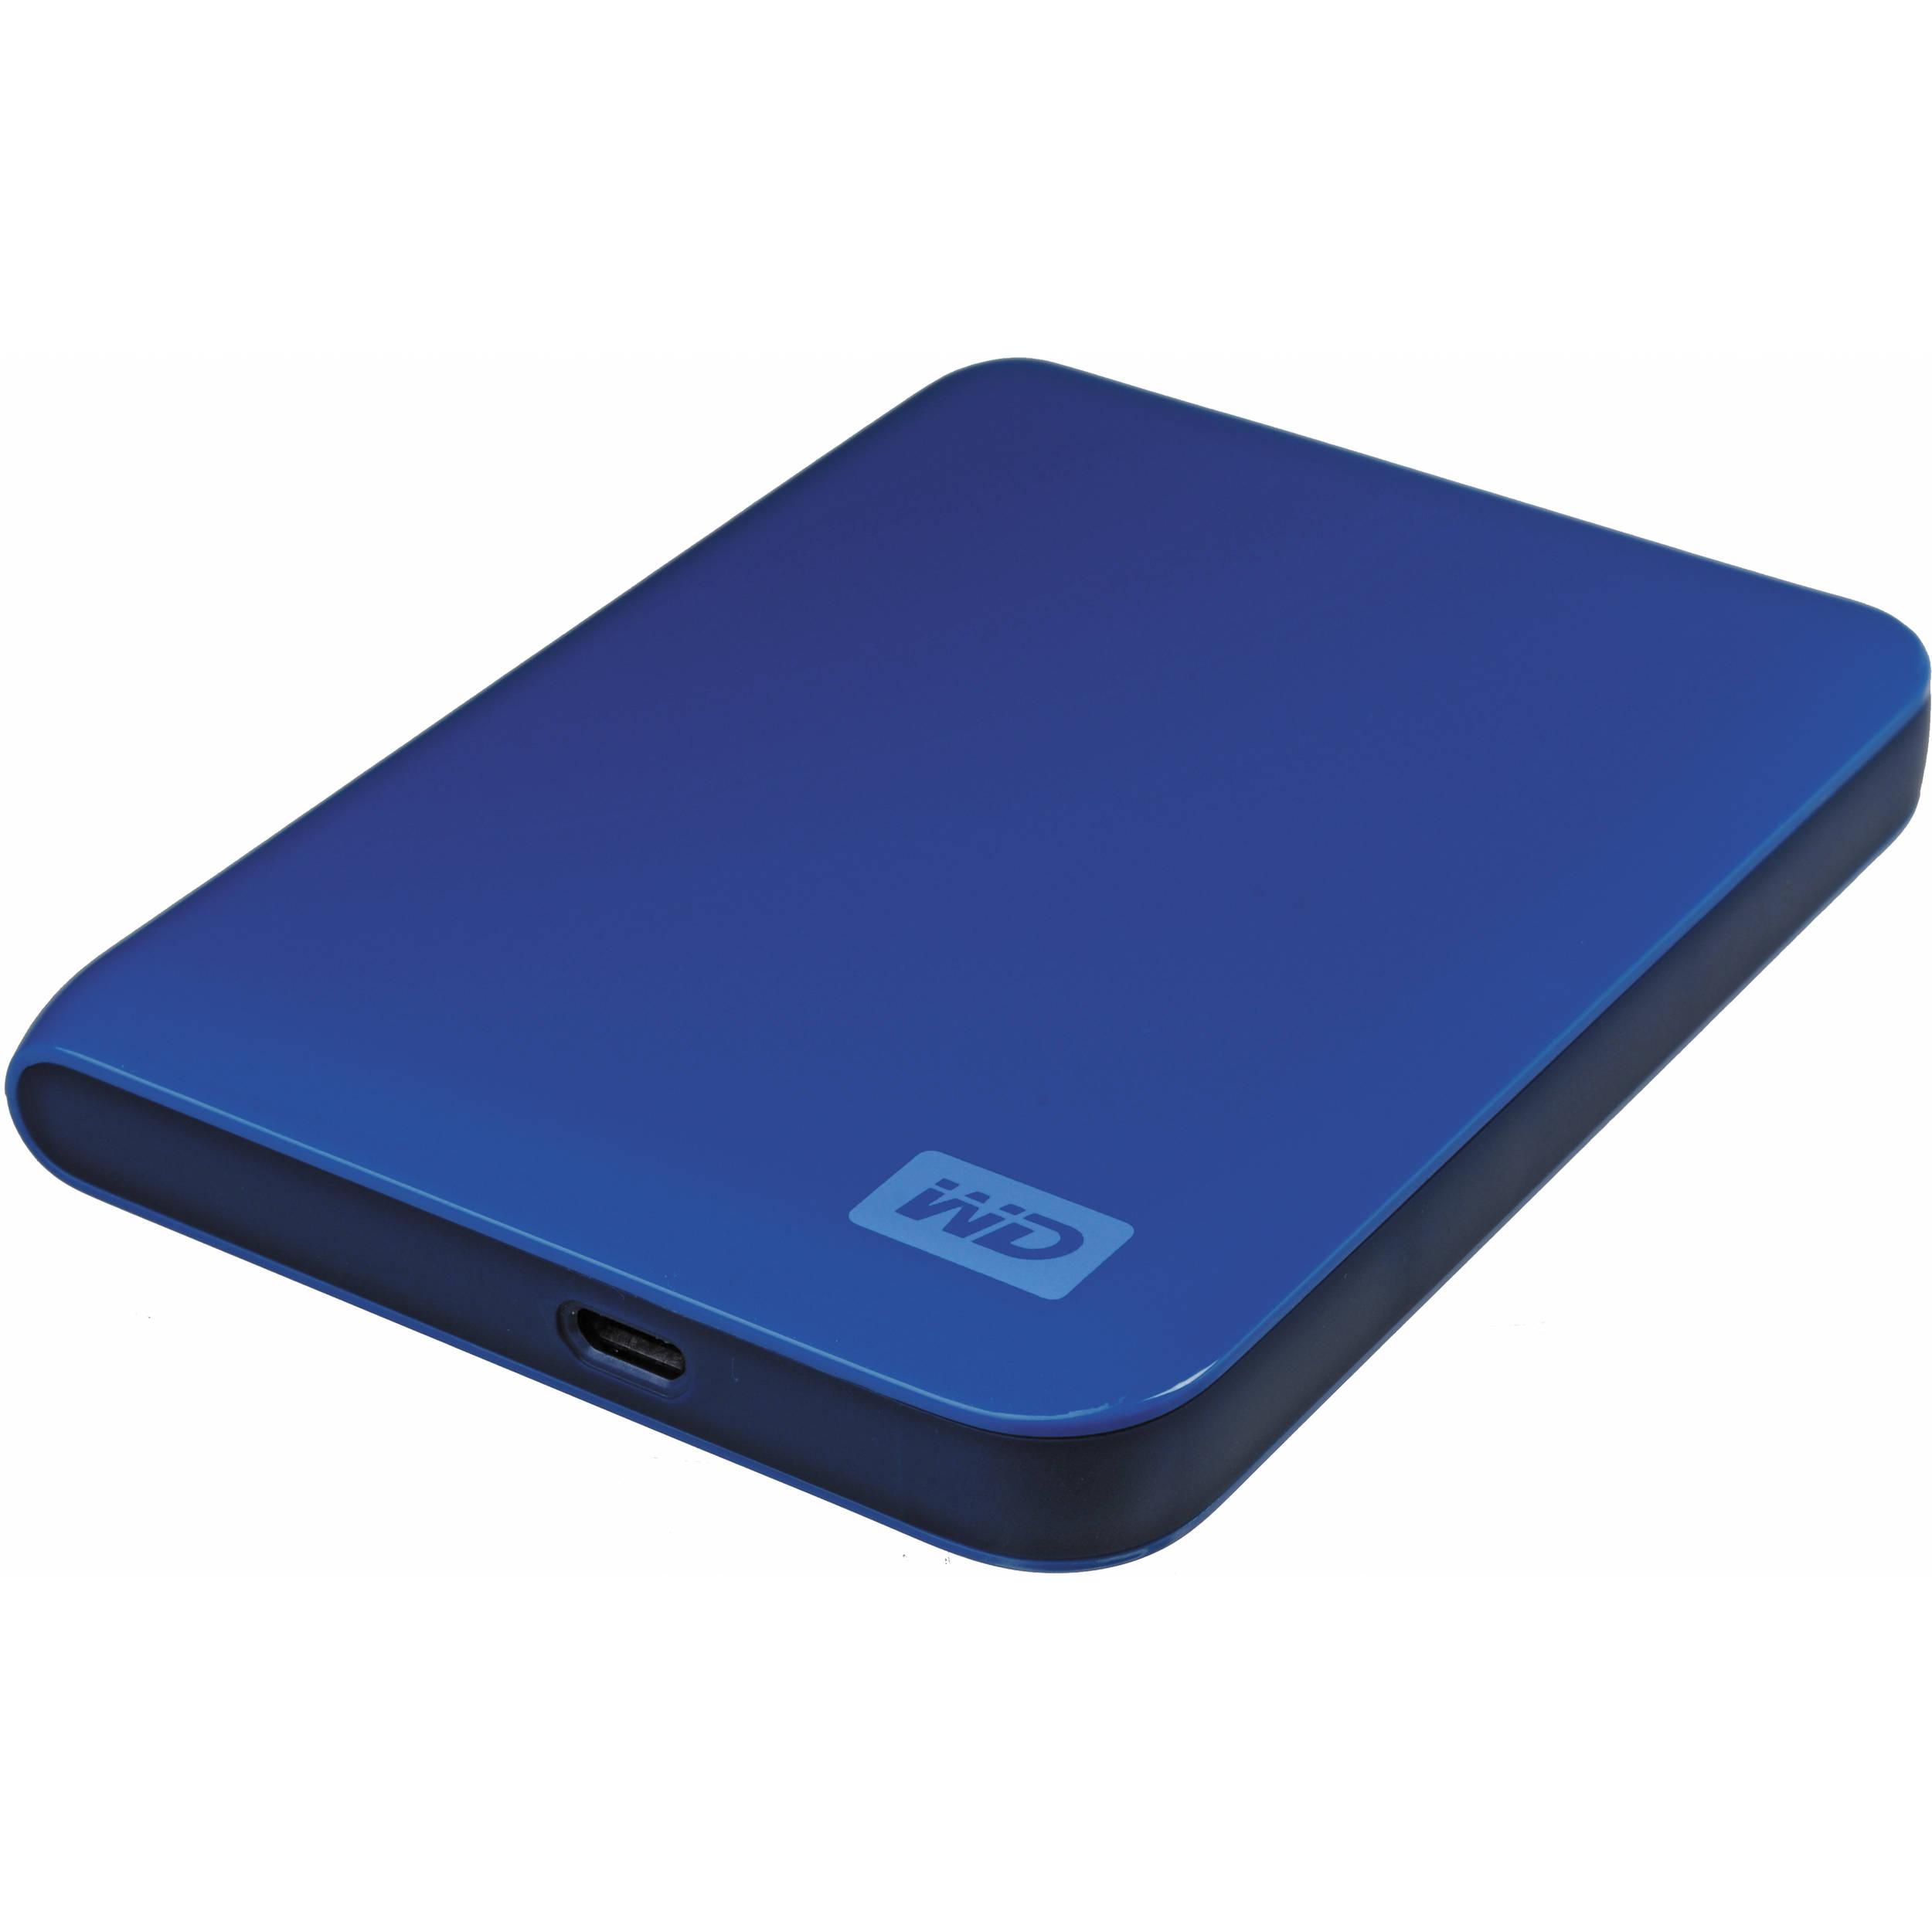 Wd My Passport Ultra 500Gb External Portable Hard Drive For Mac